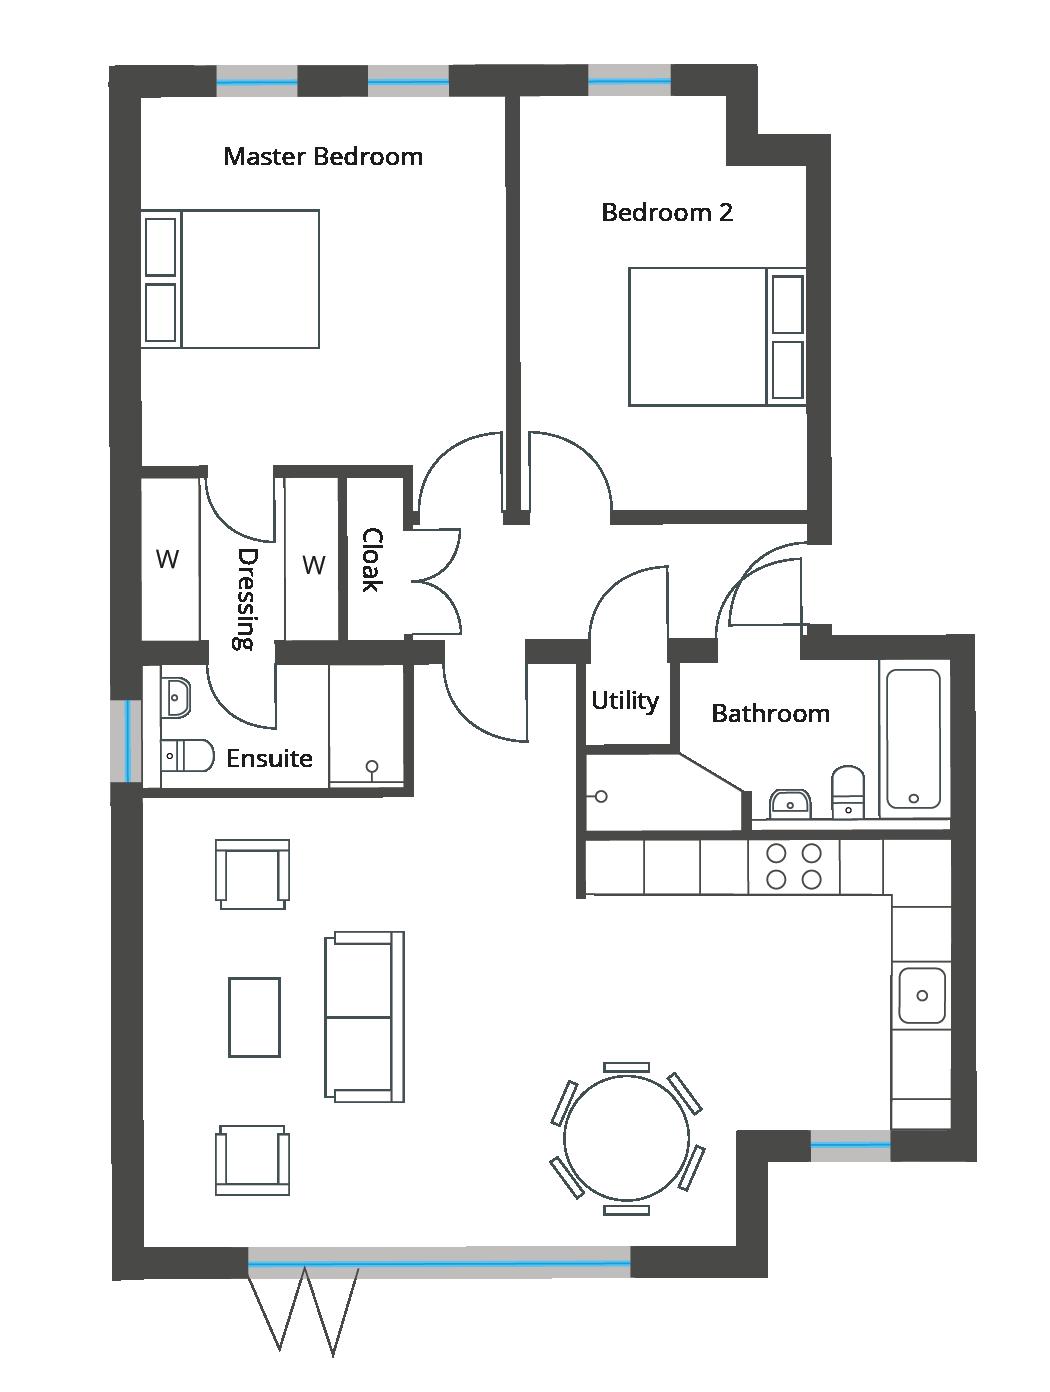 Floorplan for Apartment 5